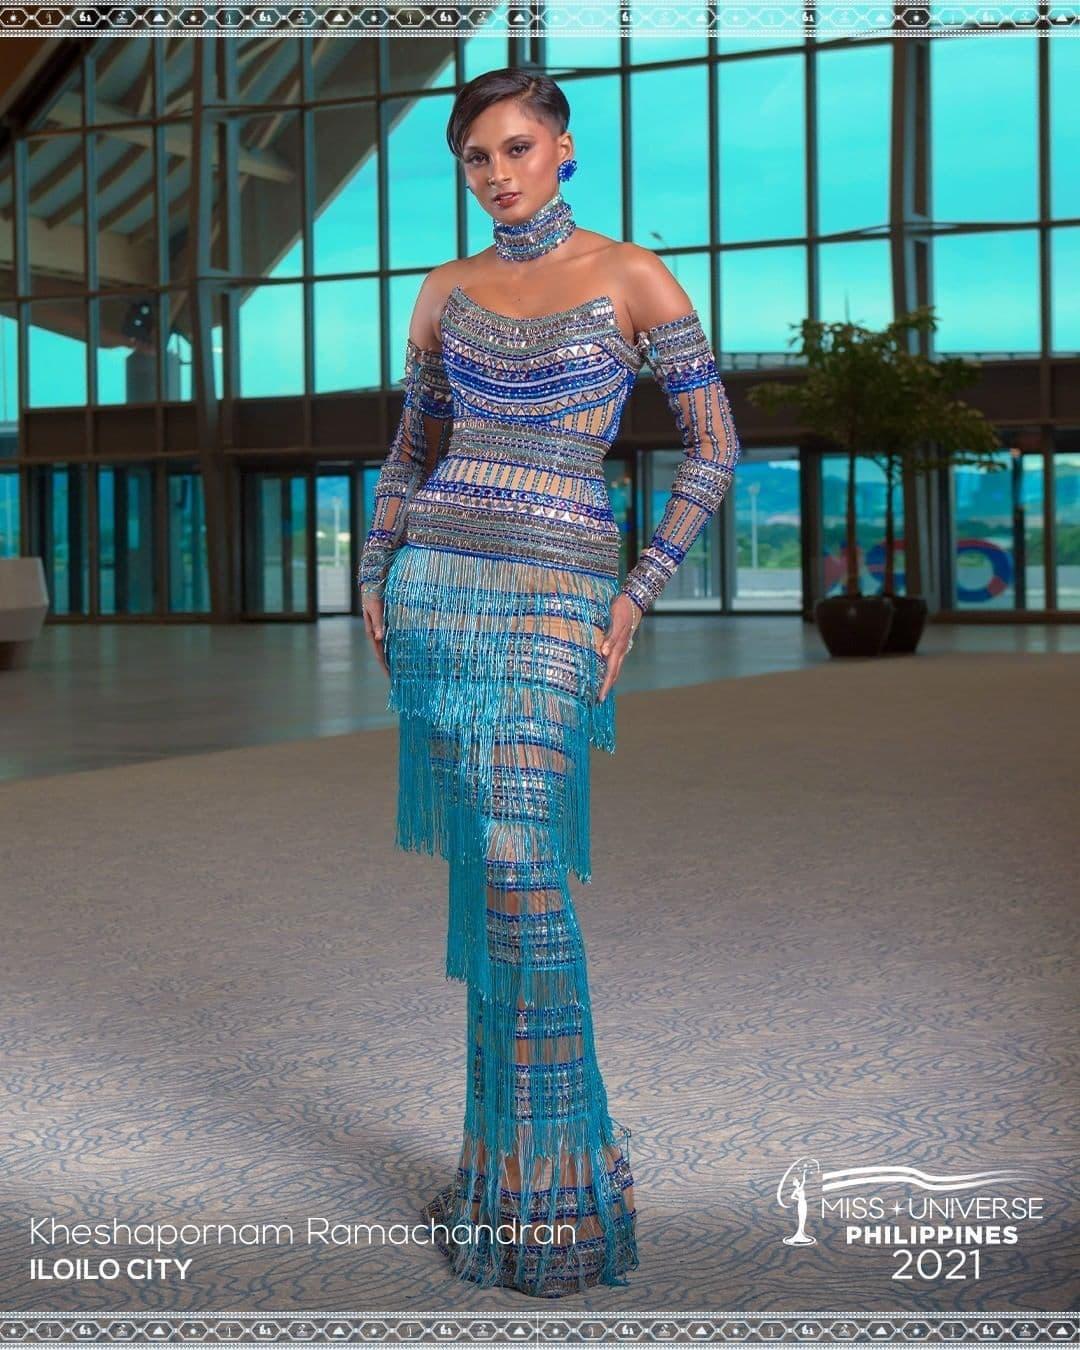 khesha-ramachandran-miss-universe-gown